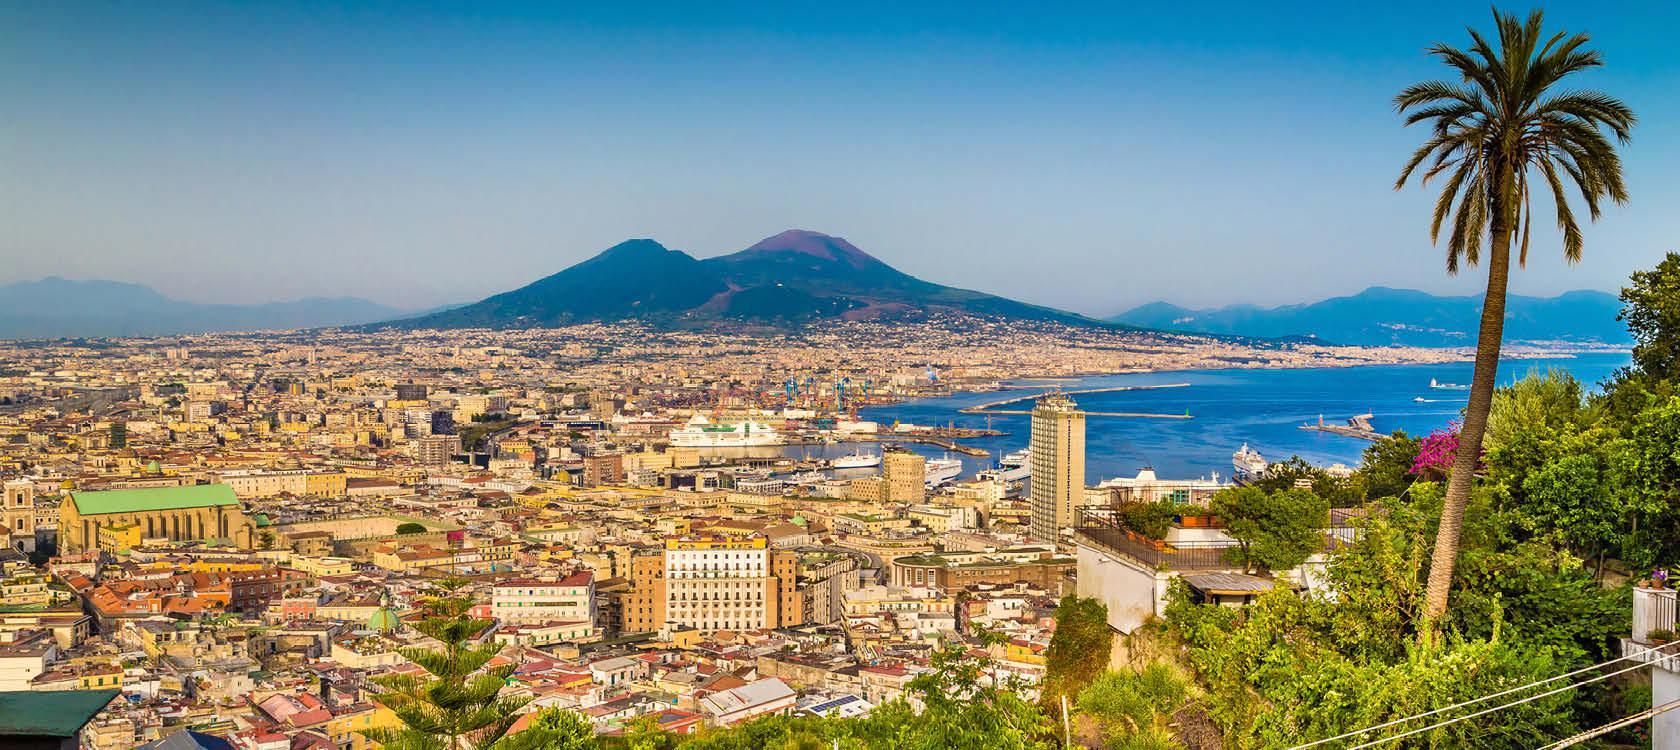 Napoli og Vesuv